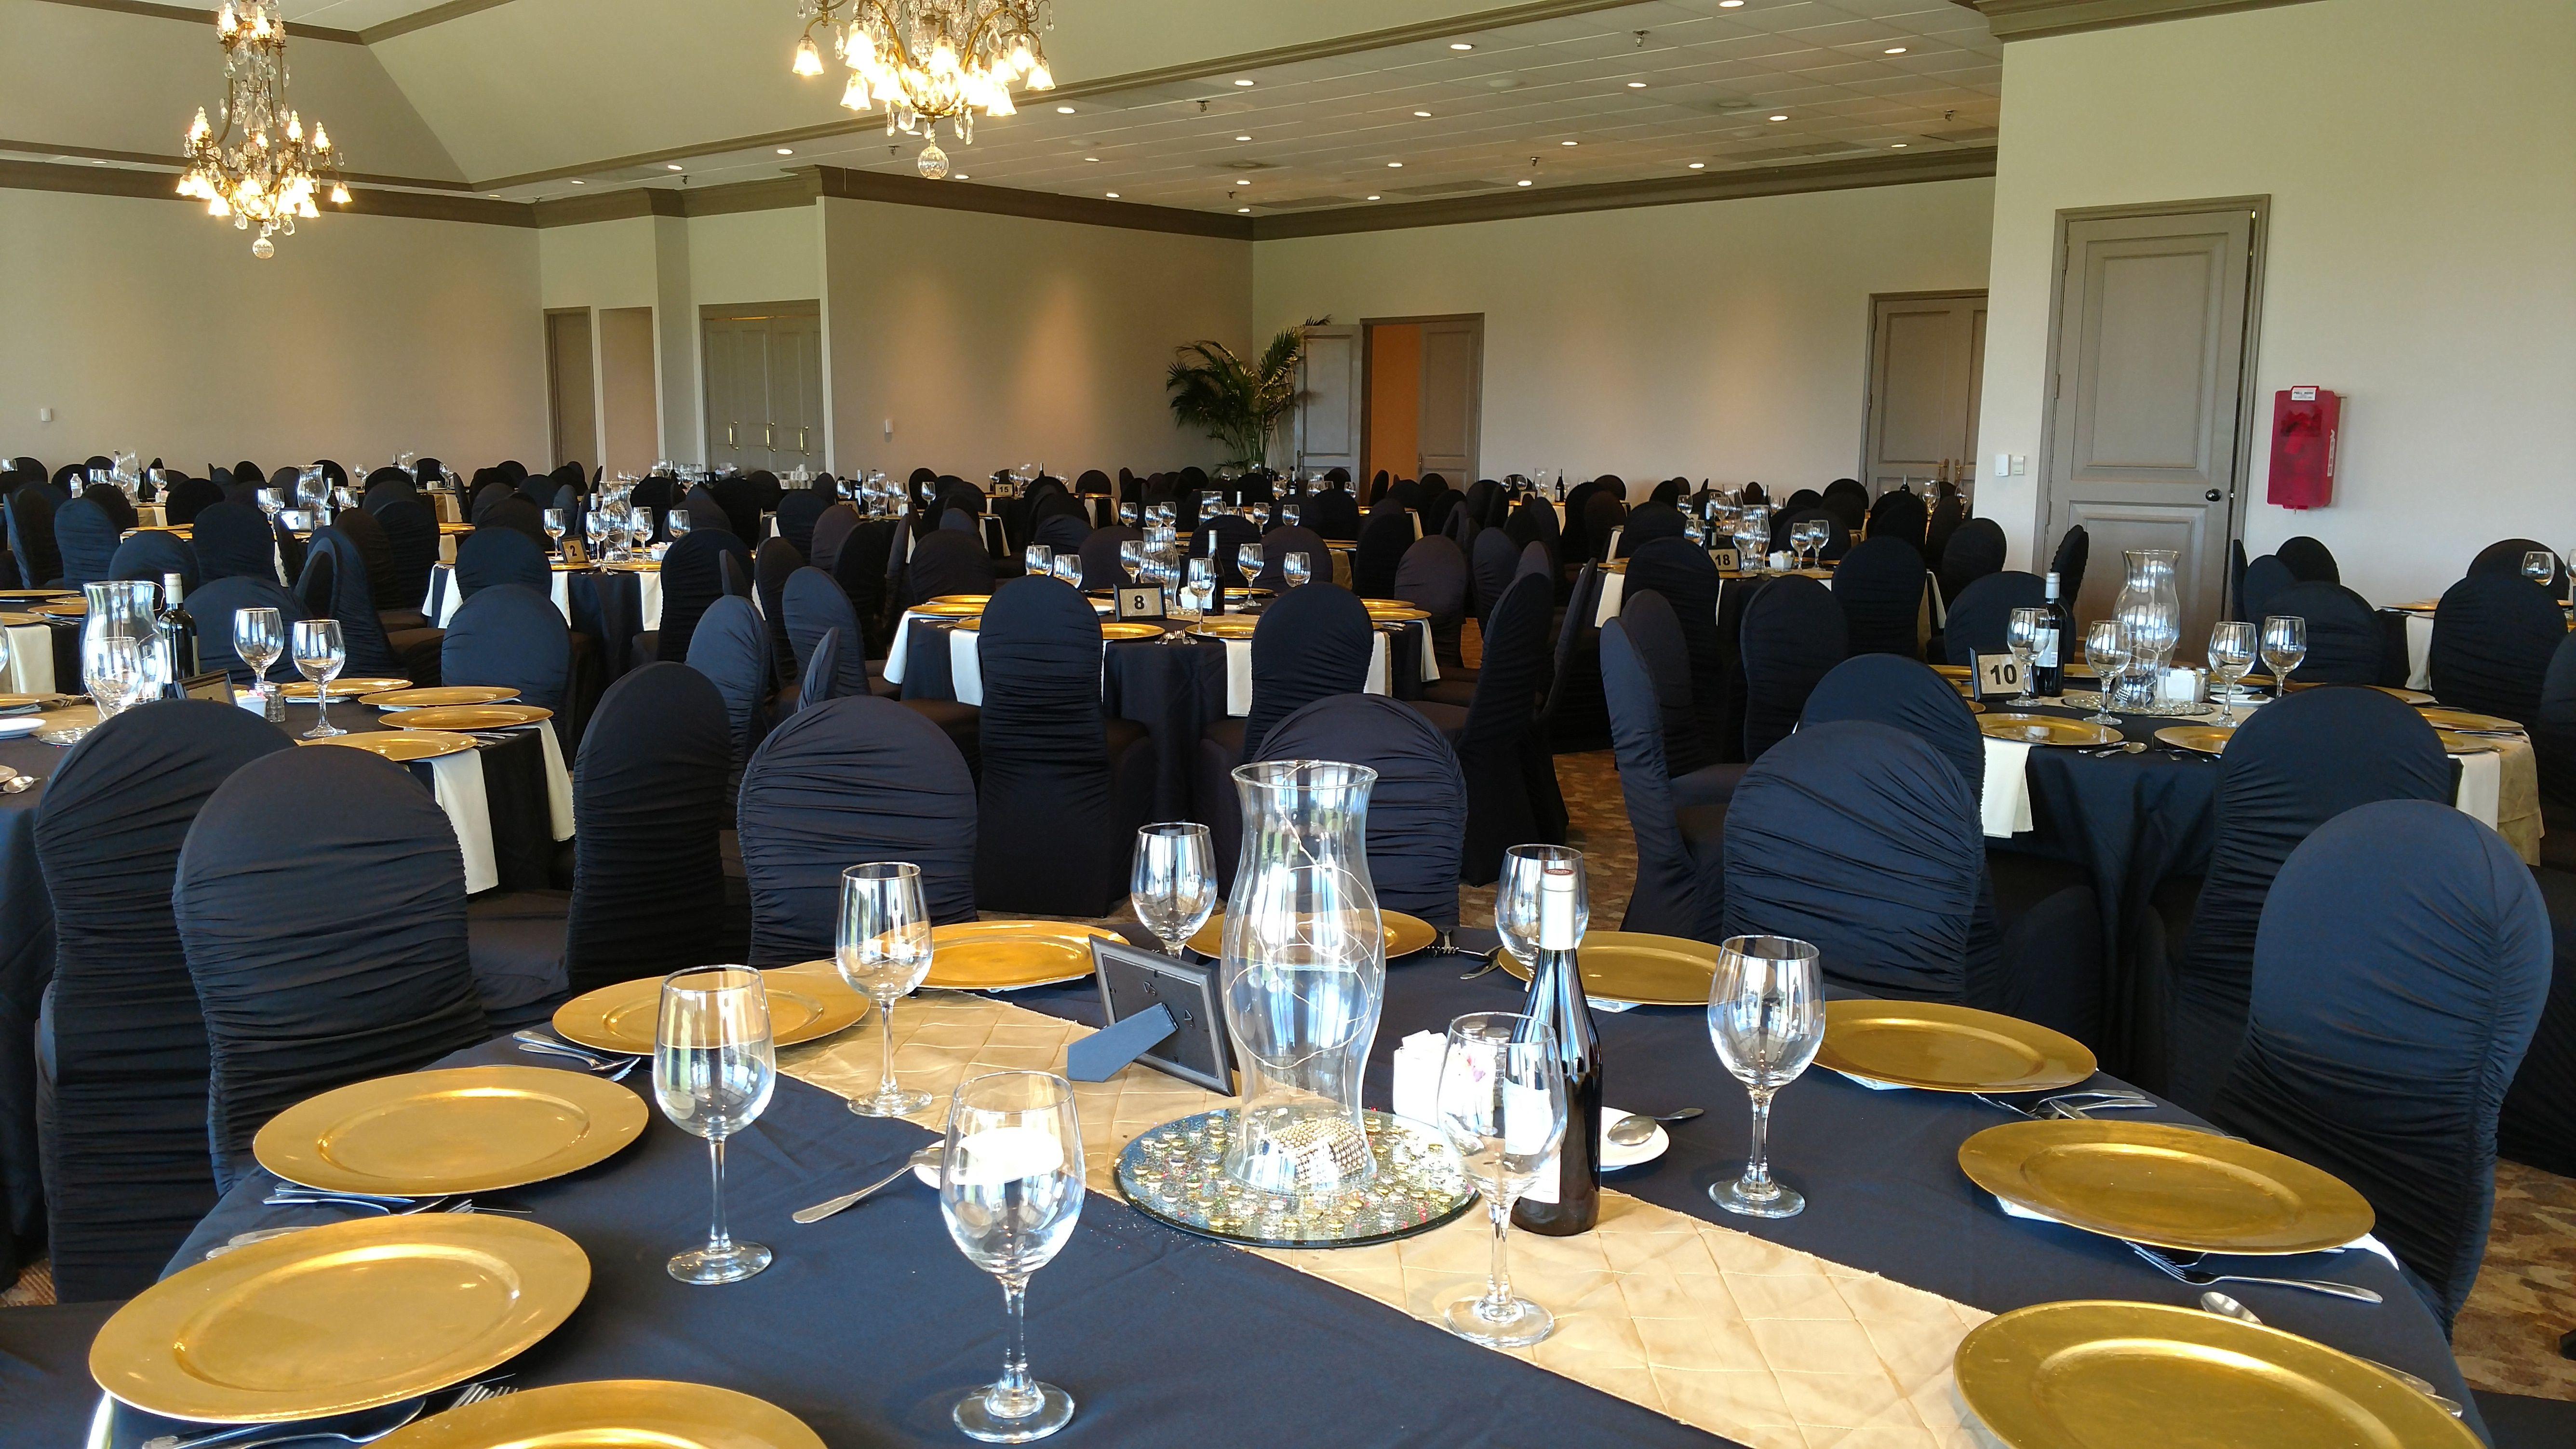 Elegant Awards Gala with Black Floor Length Linens Black Spandex